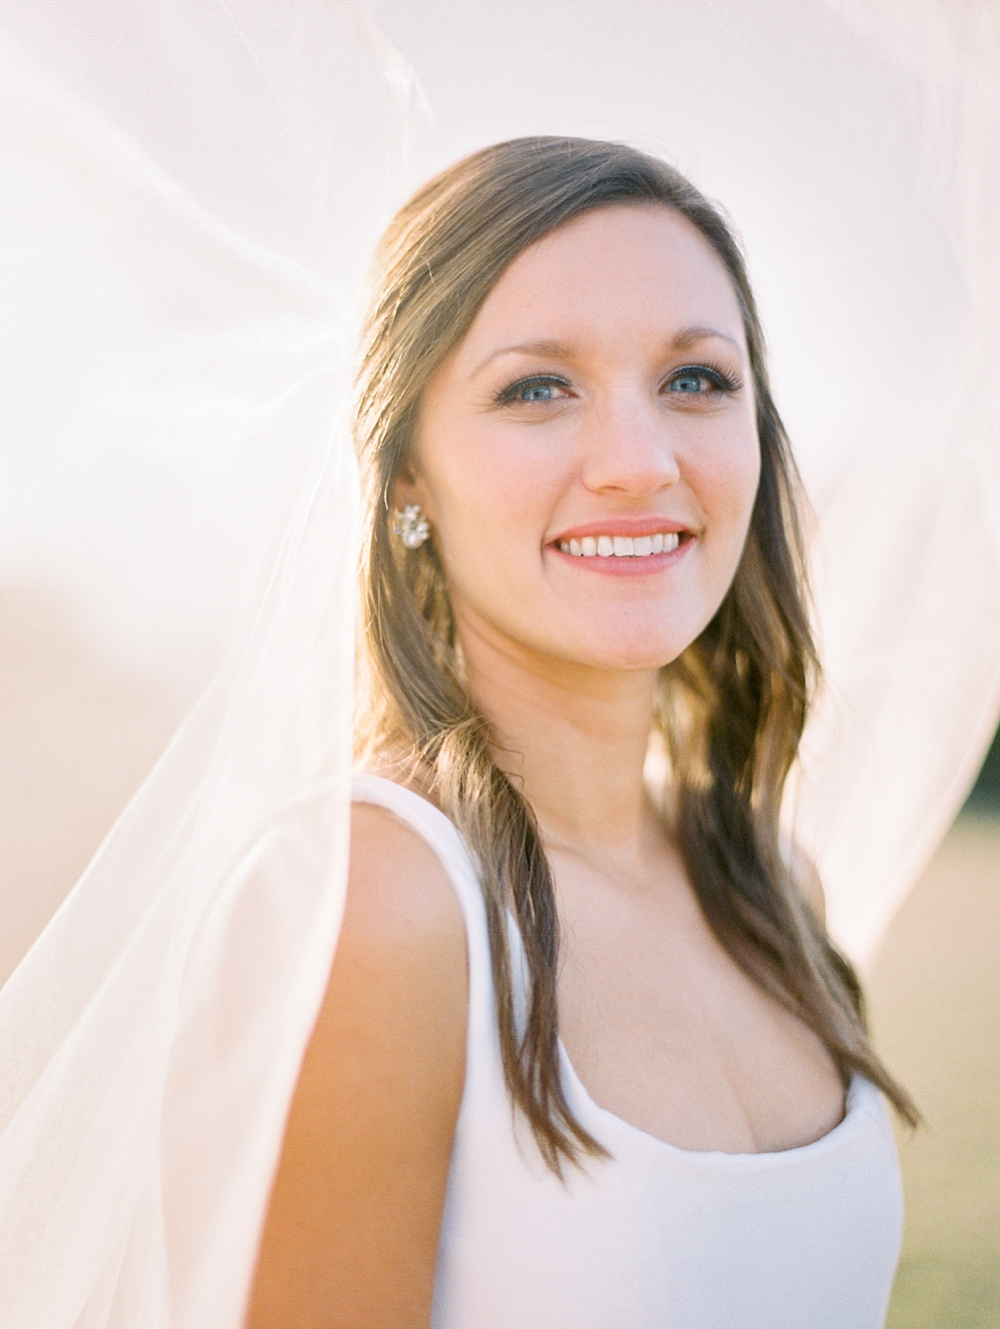 Kristin-La-Voie-Photography-austin-houston-texas-wedding-photographer-the-oaks-at-high-hill -22